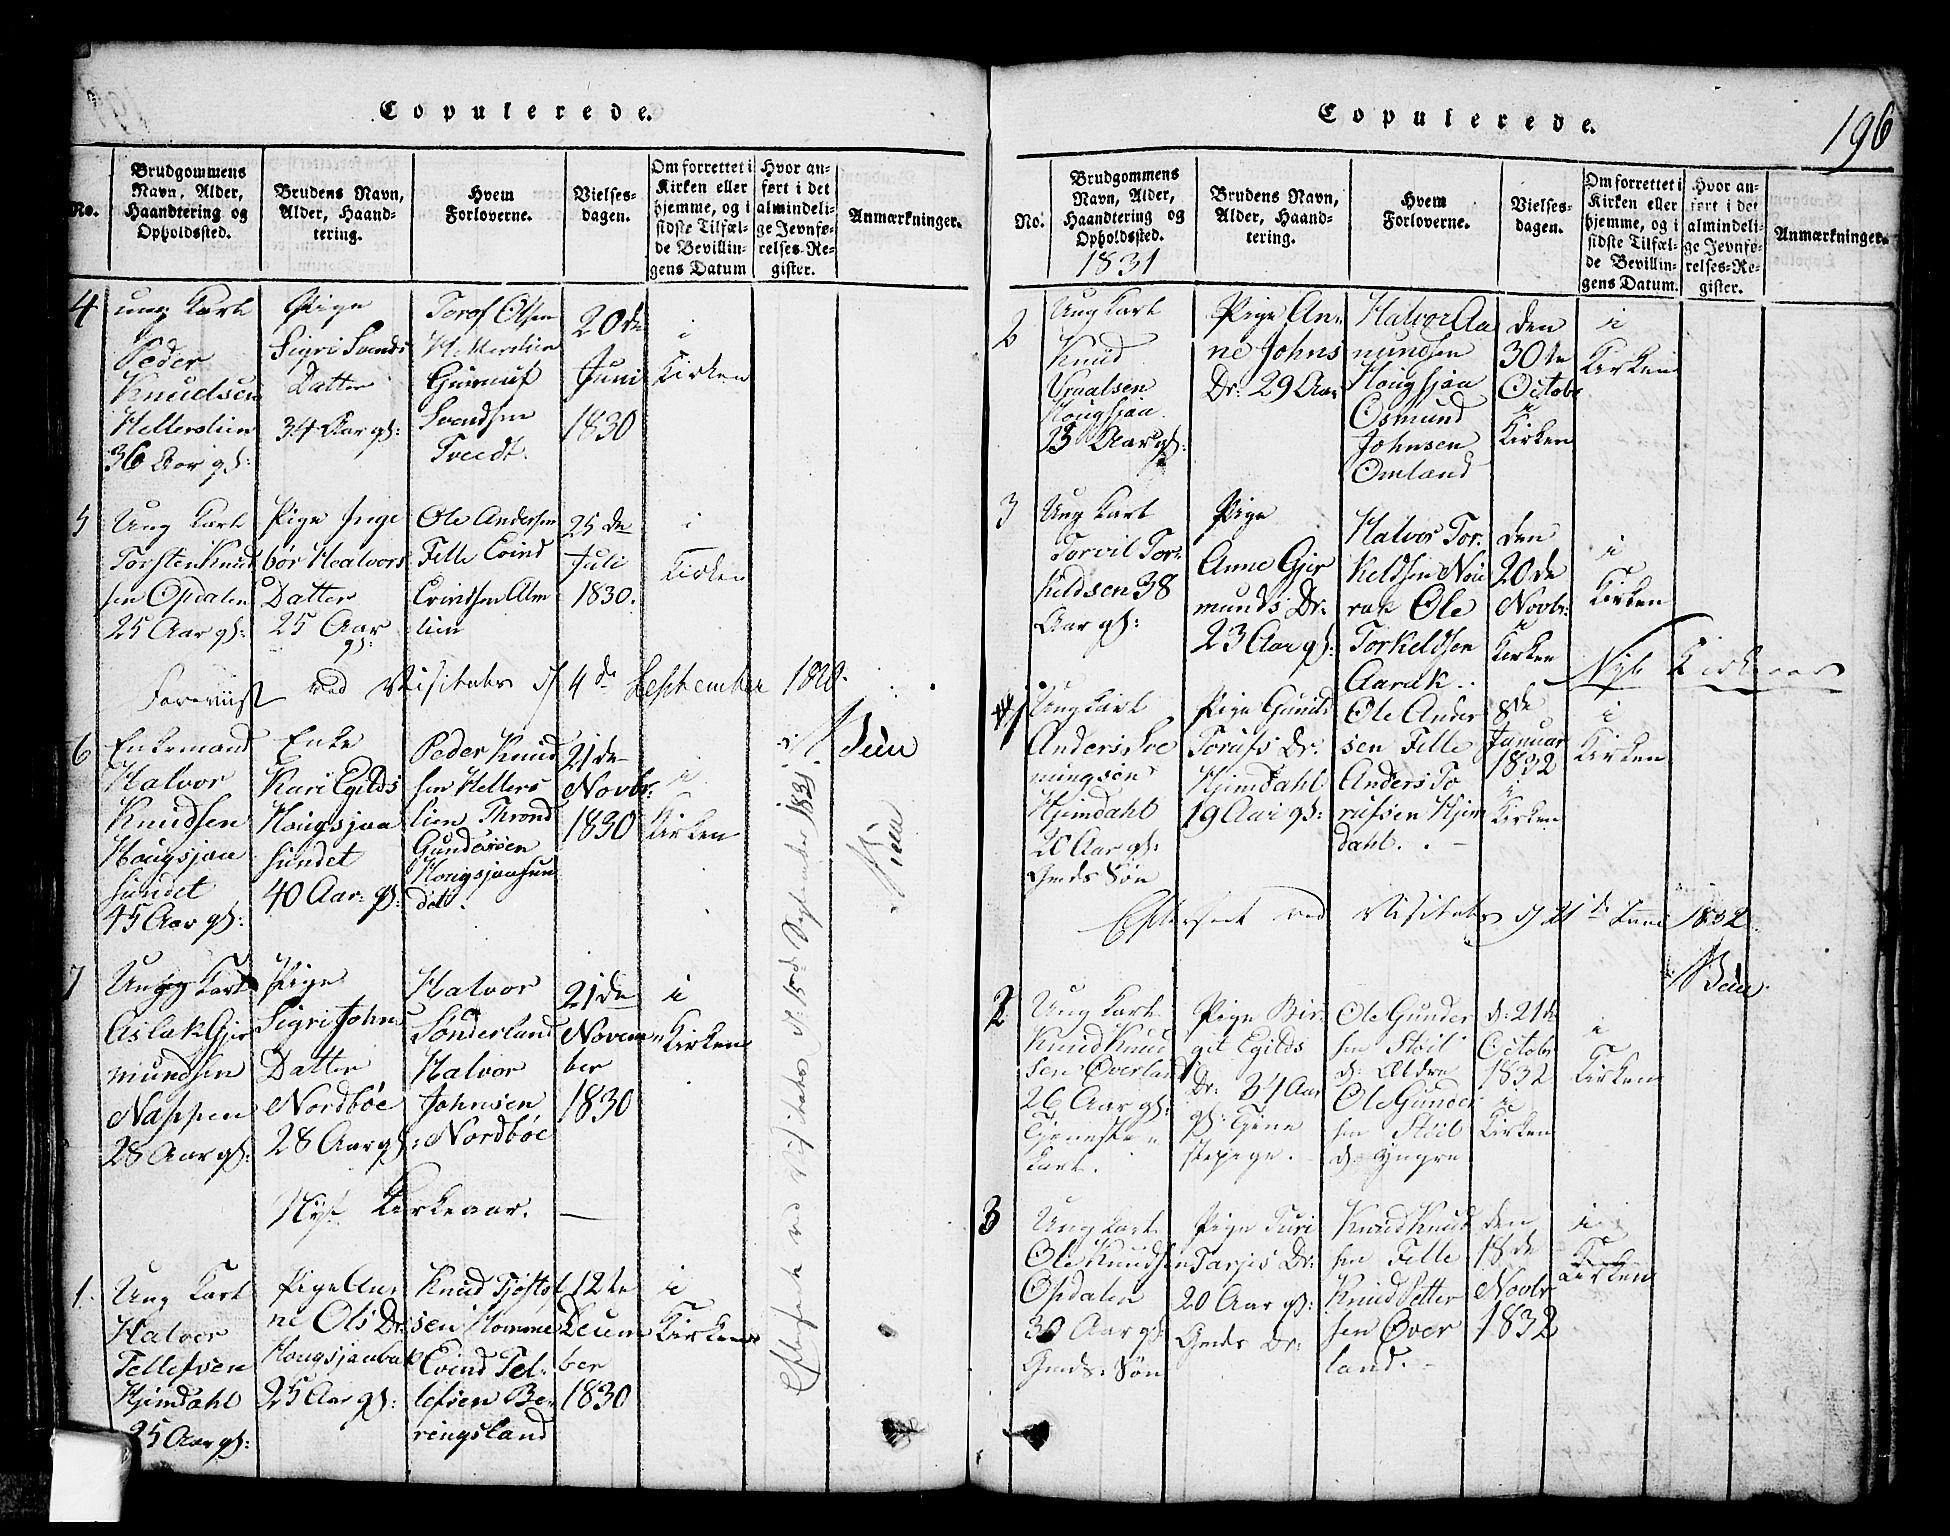 SAKO, Nissedal kirkebøker, G/Gb/L0001: Klokkerbok nr. II 1, 1814-1862, s. 196